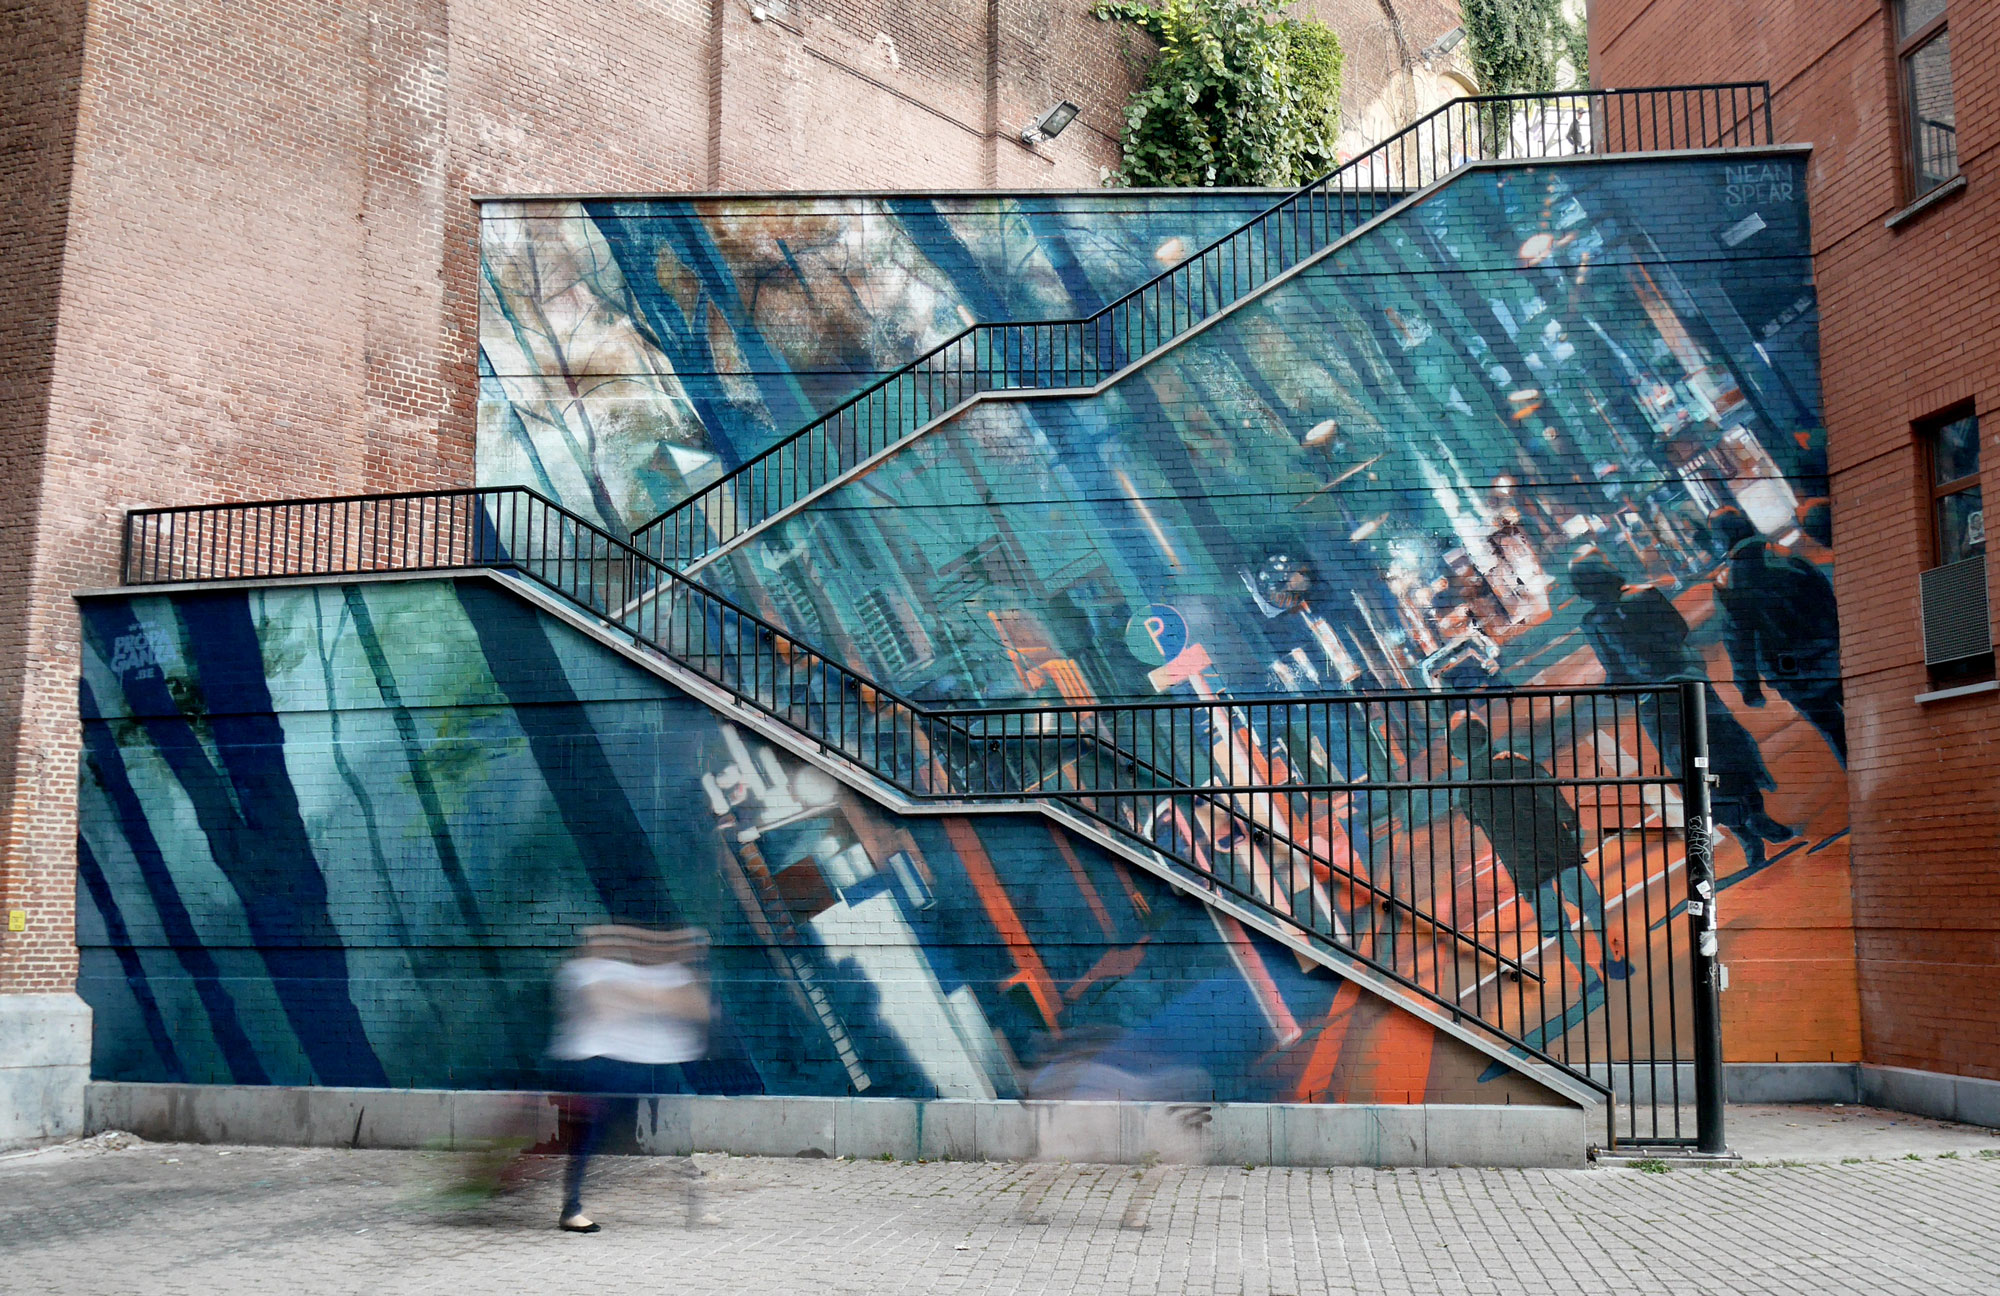 https://www.propaganza.be/wp-content/uploads/2020/02/coordination-fresque_Artistes-Nean-Spear-_-Brussels-copie.jpg